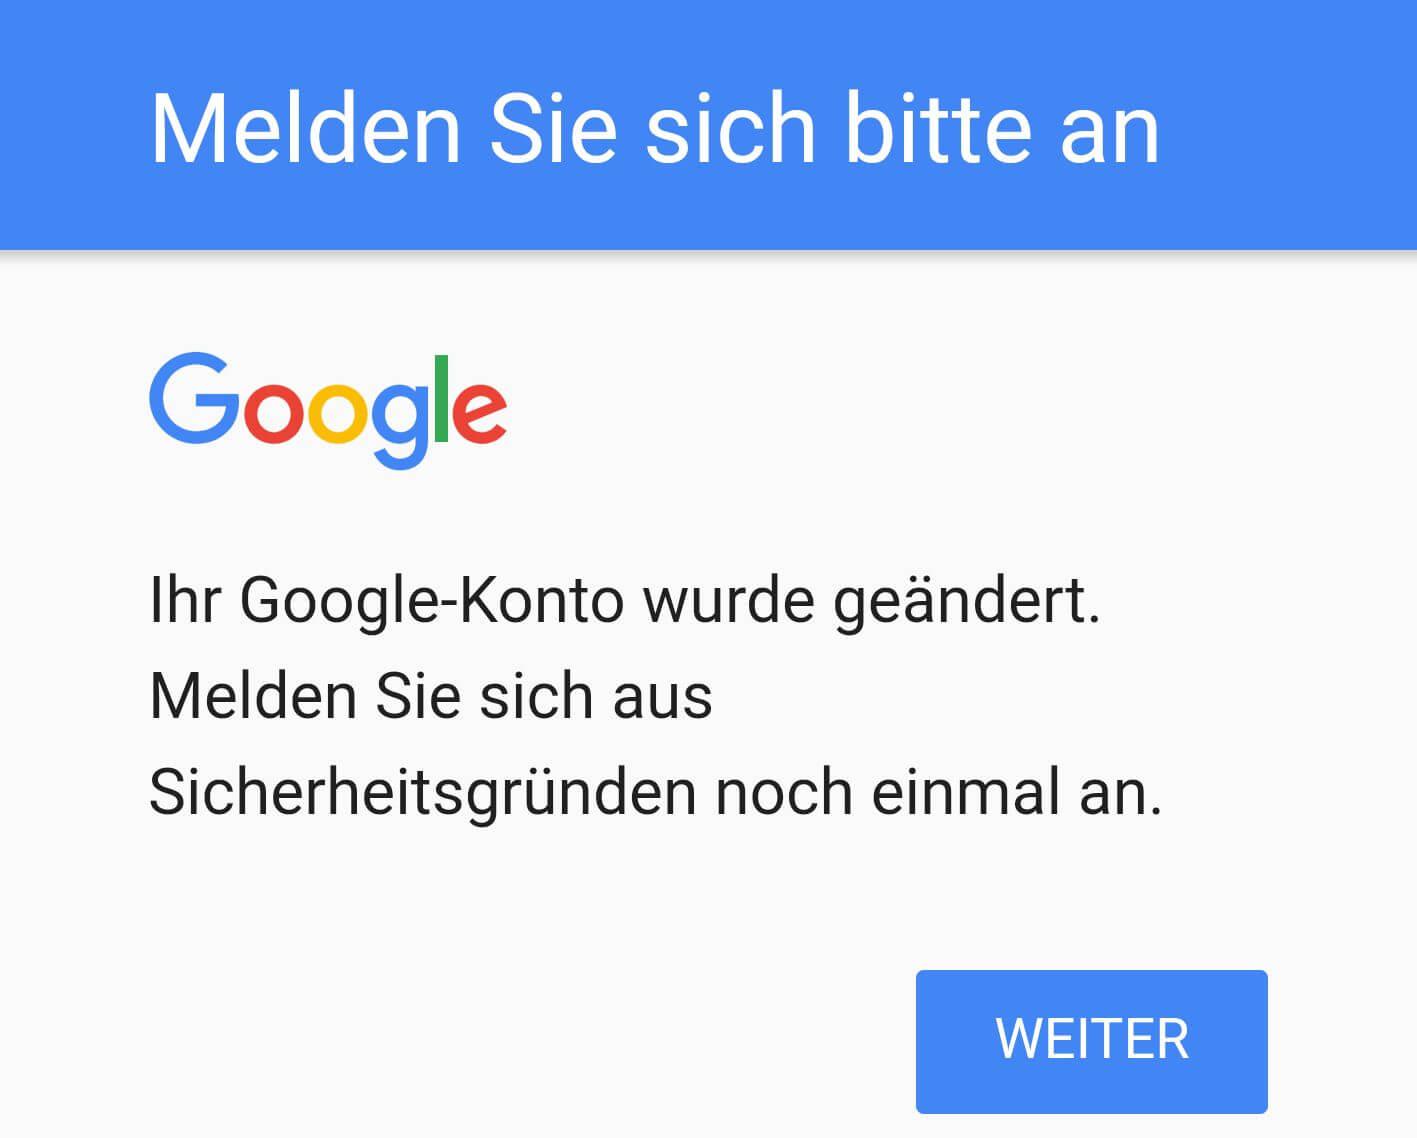 google fehler